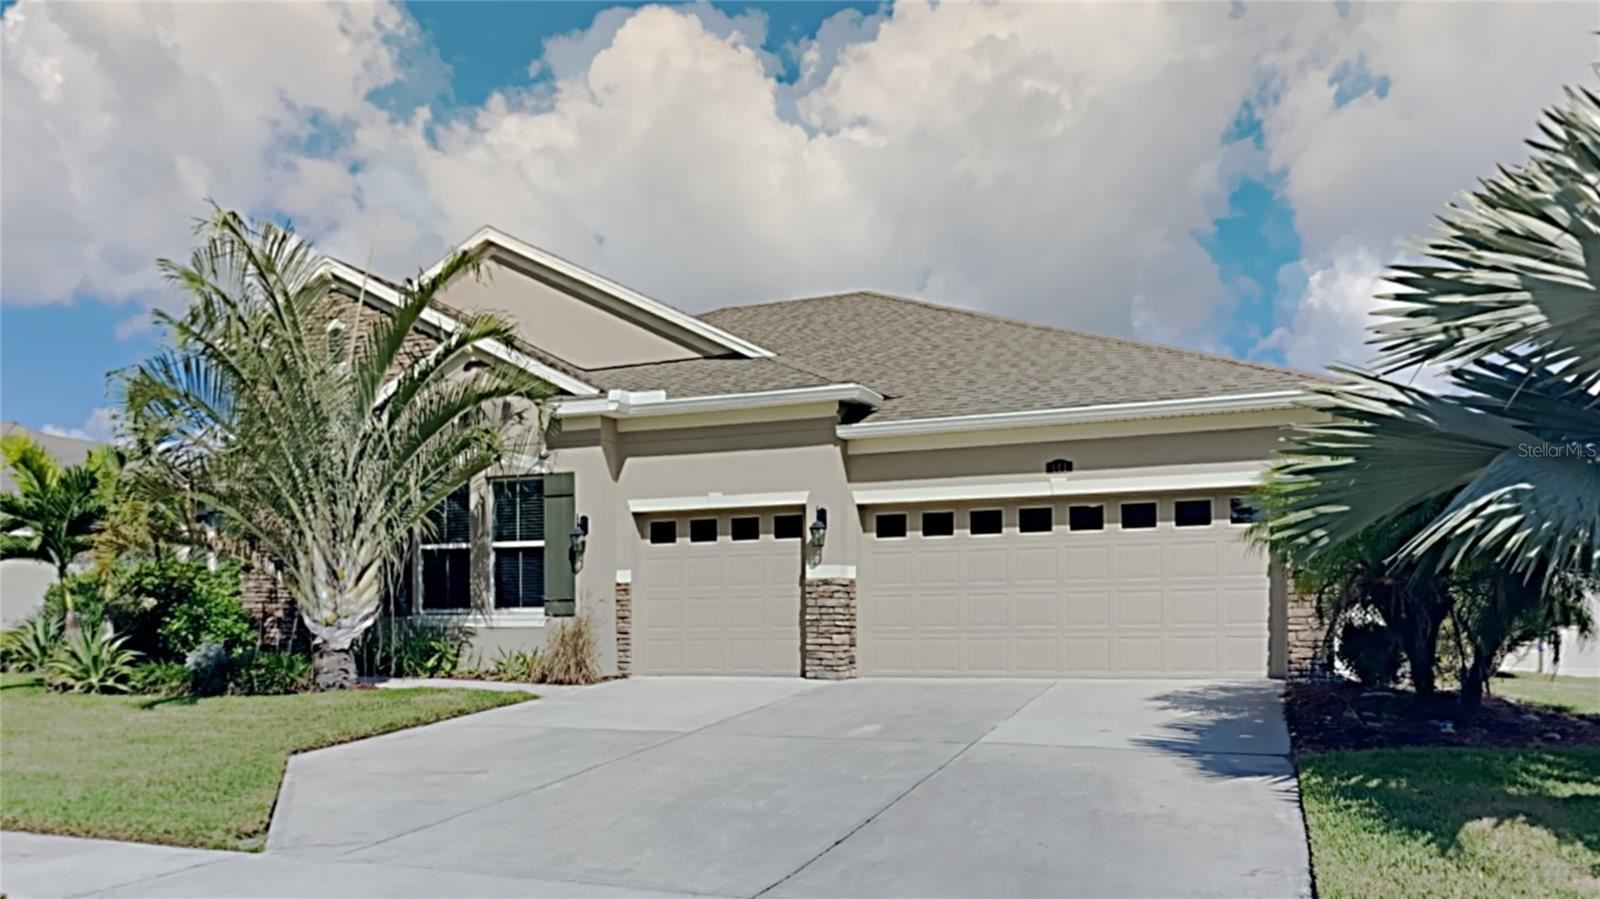 441 AMETHYST AVENUE, Auburndale, FL 33823 - #: T3336177